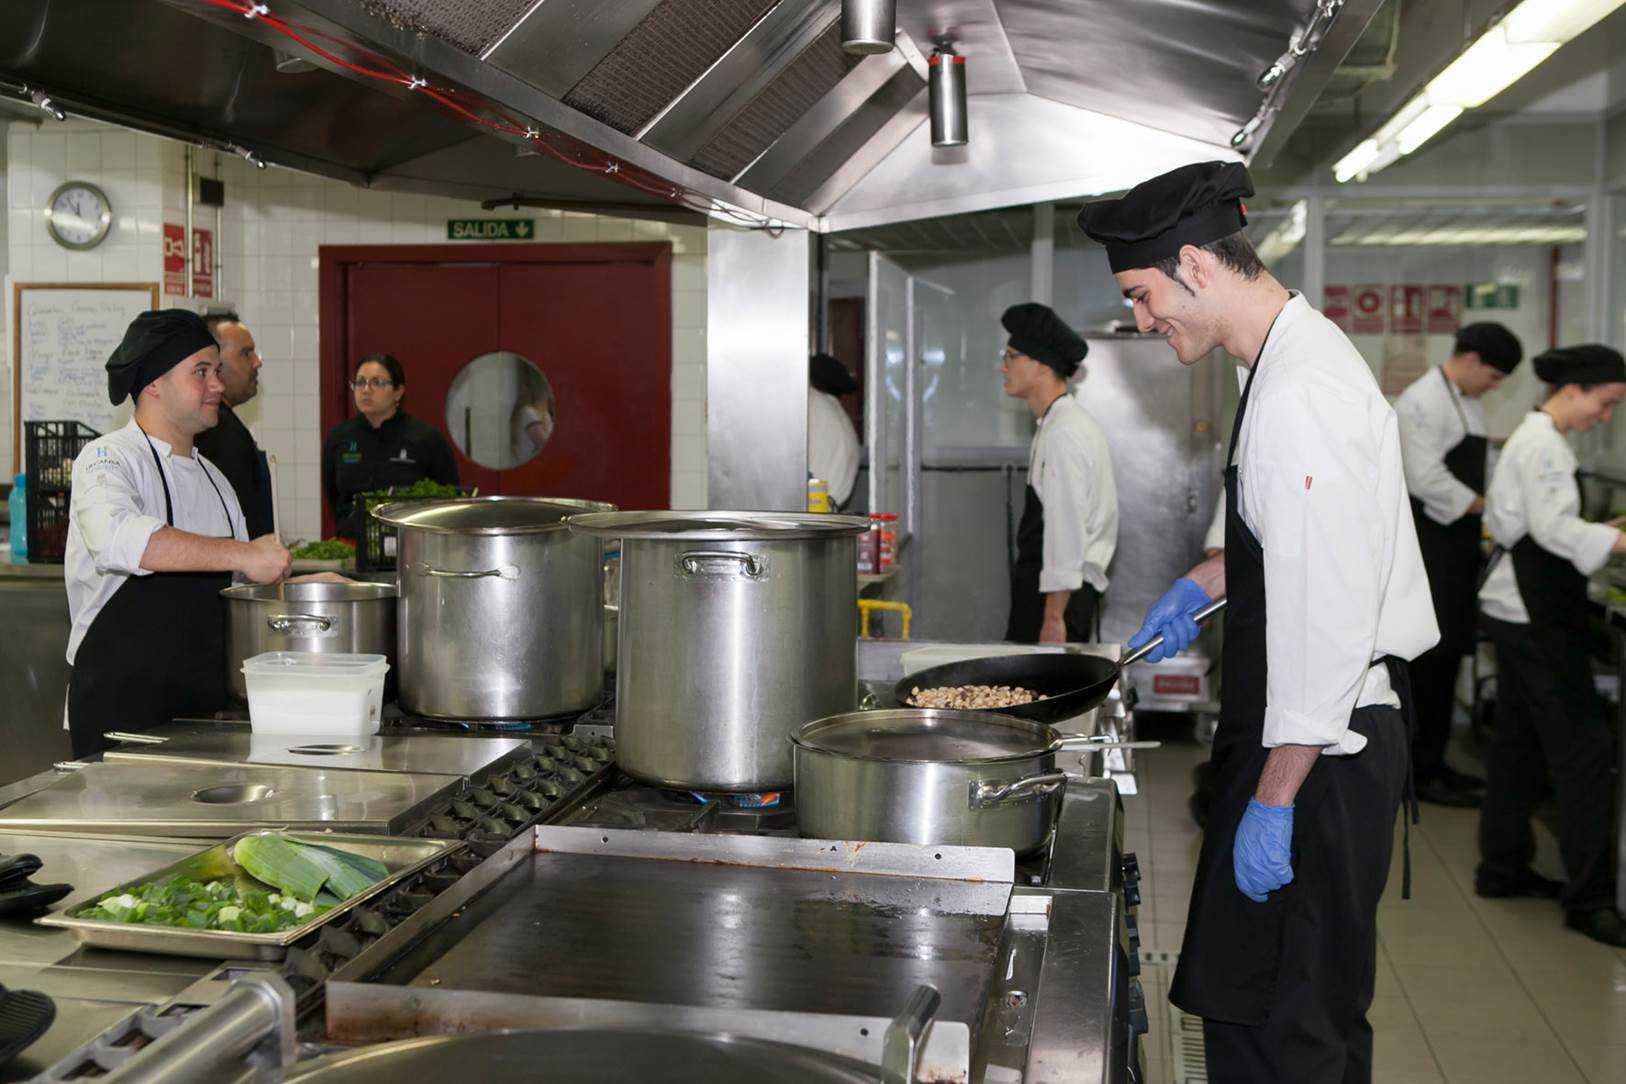 Canarias noticias for Practicas de cocina